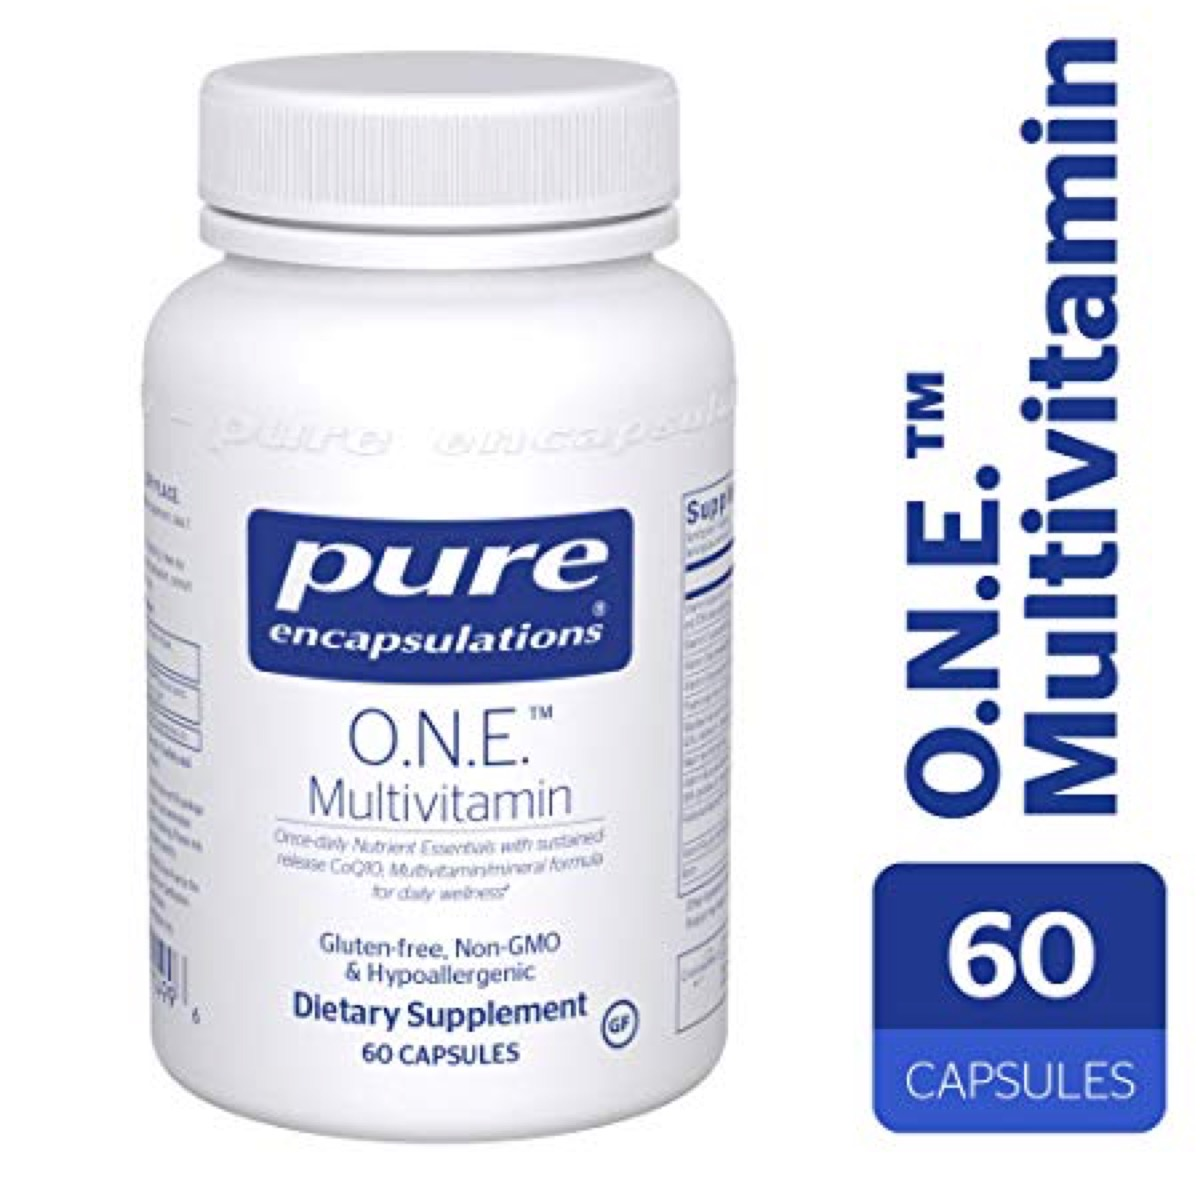 pure encapsulations one multivitamin, best multivitamin for men